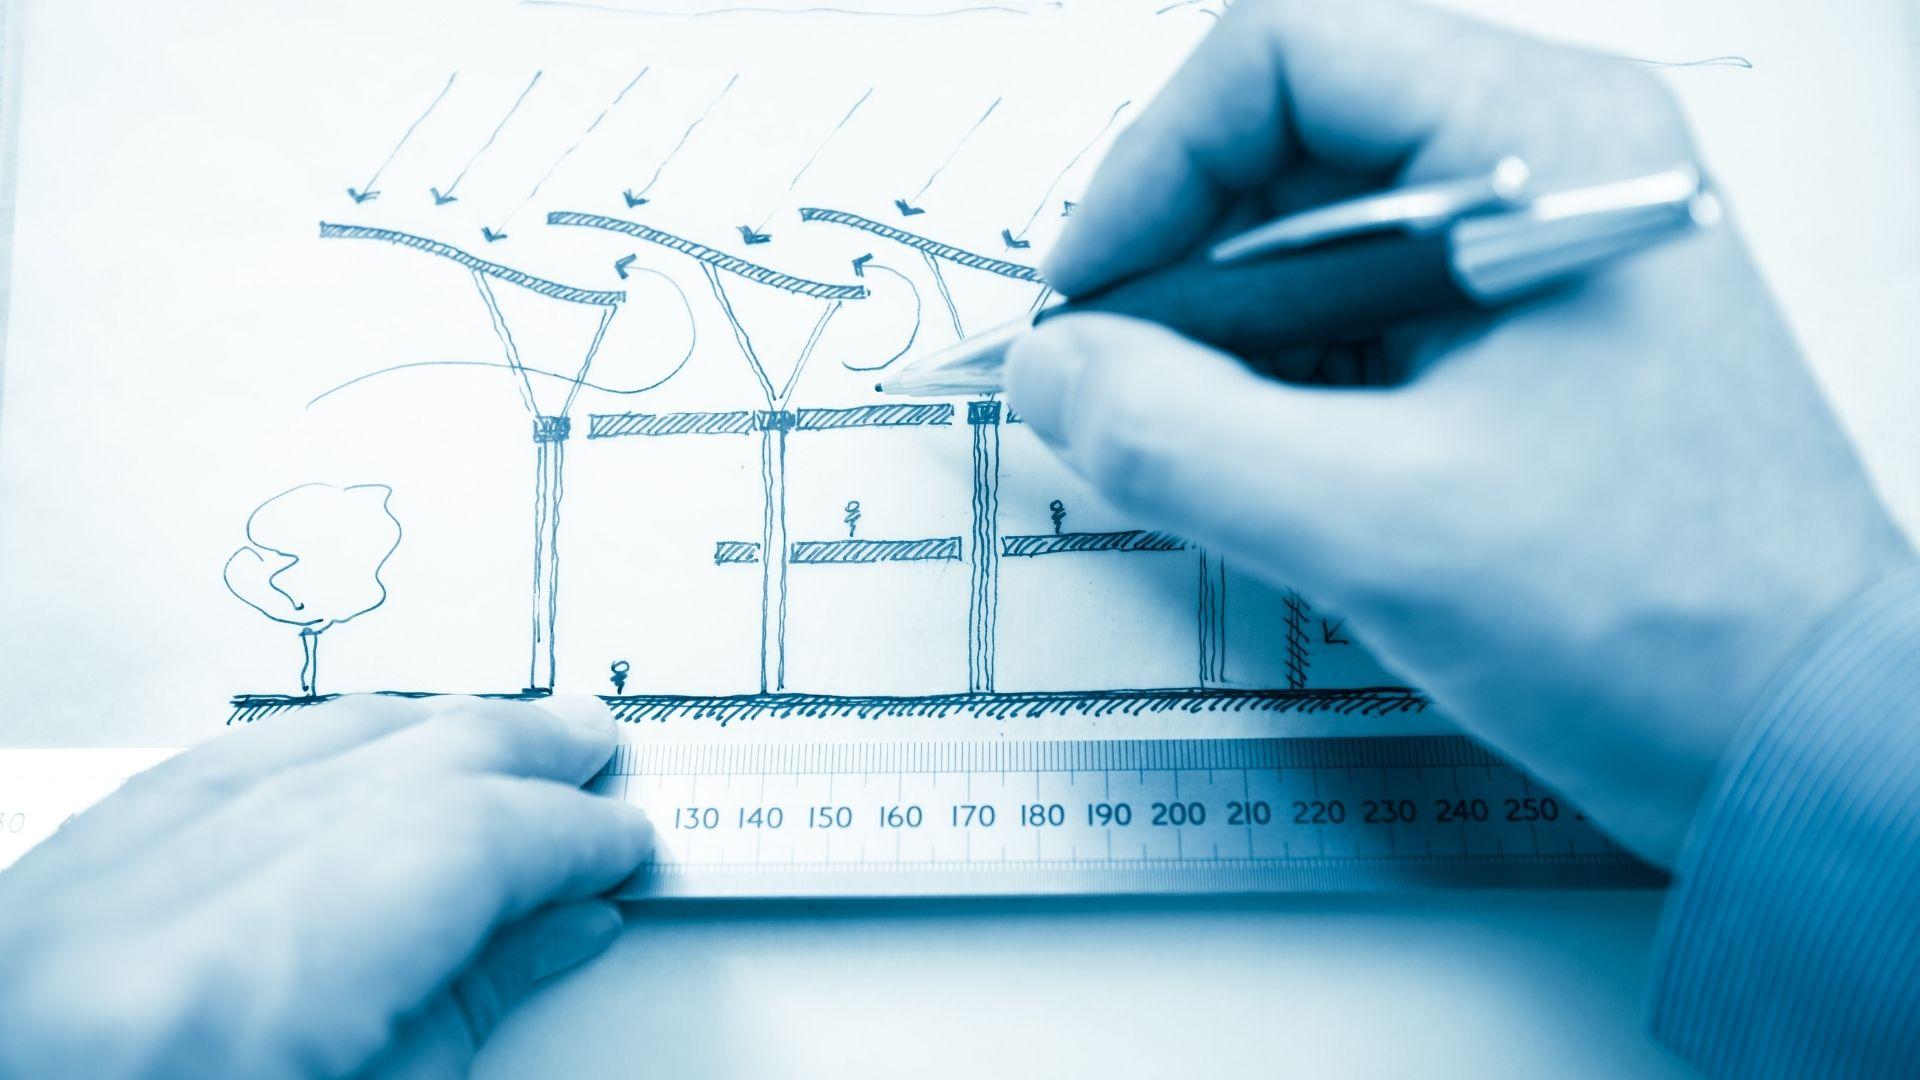 custom drawing of solar engineering design hands